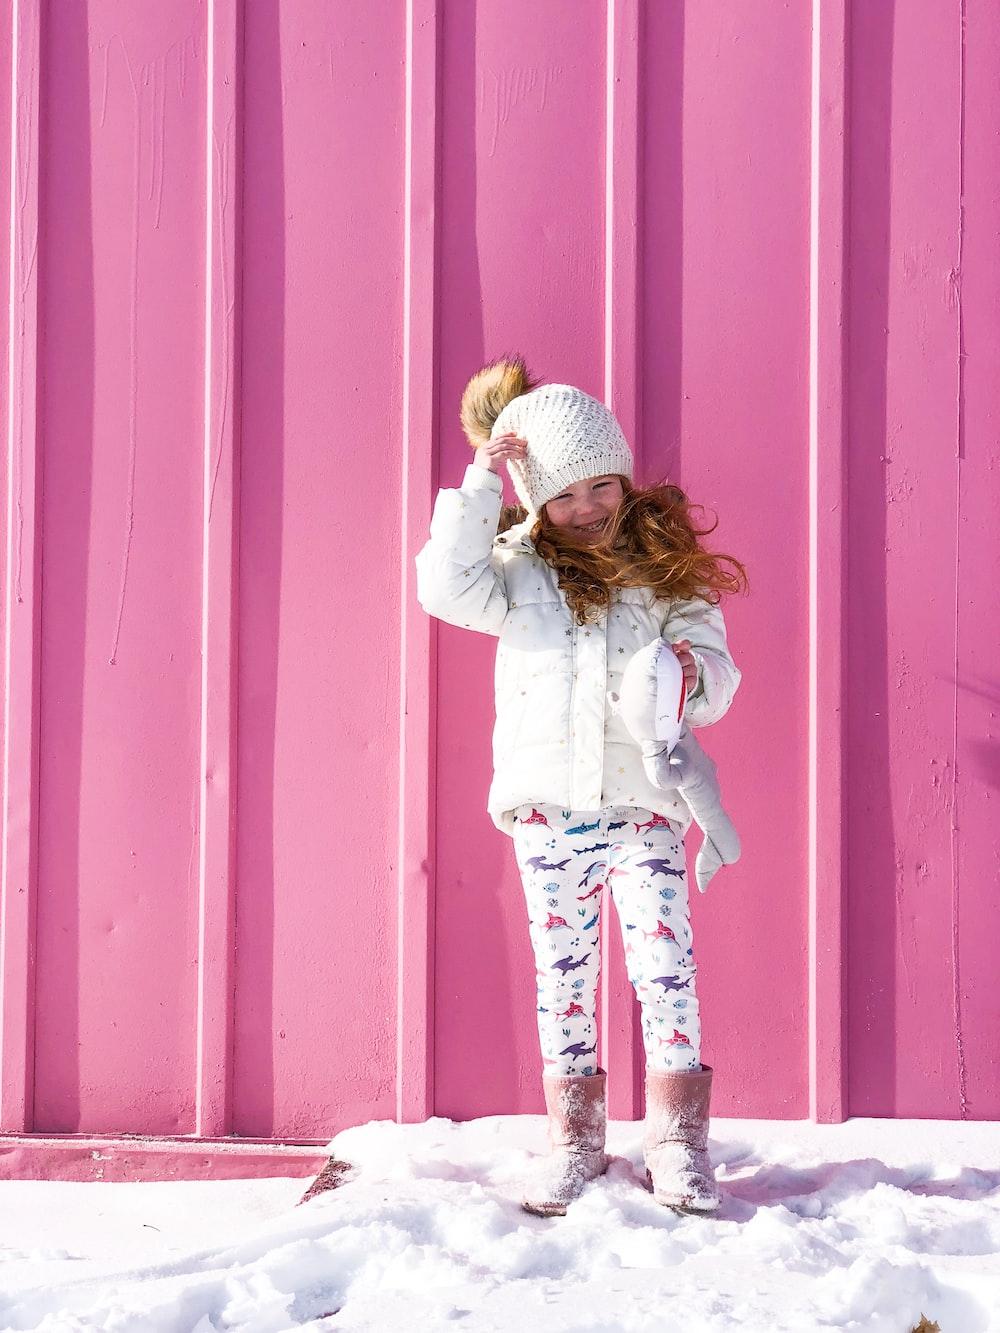 Pajamas For Kids - 21 Classiest Options